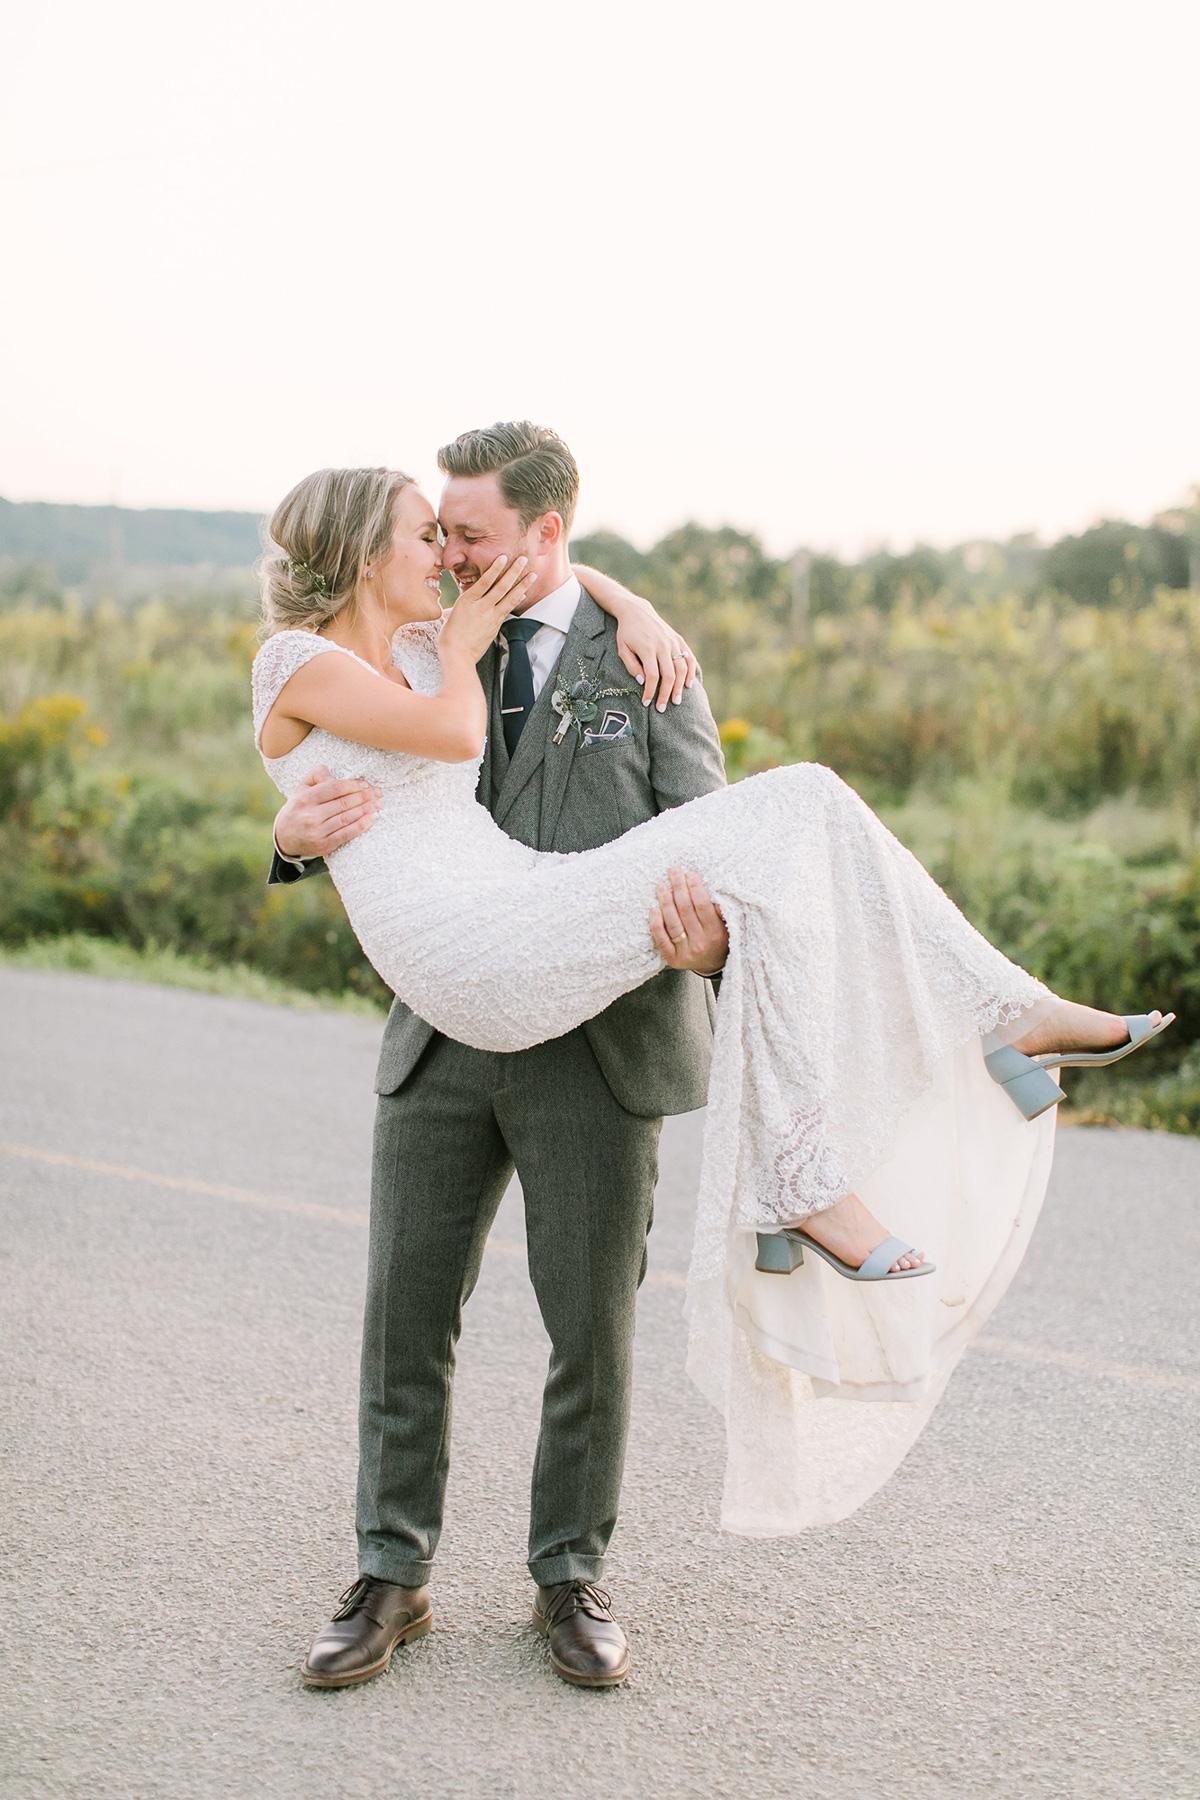 elizabeth-in-love-vineyard-bride-swish-list-cherry-avenue-farms-vineland-wedding-65.jpg